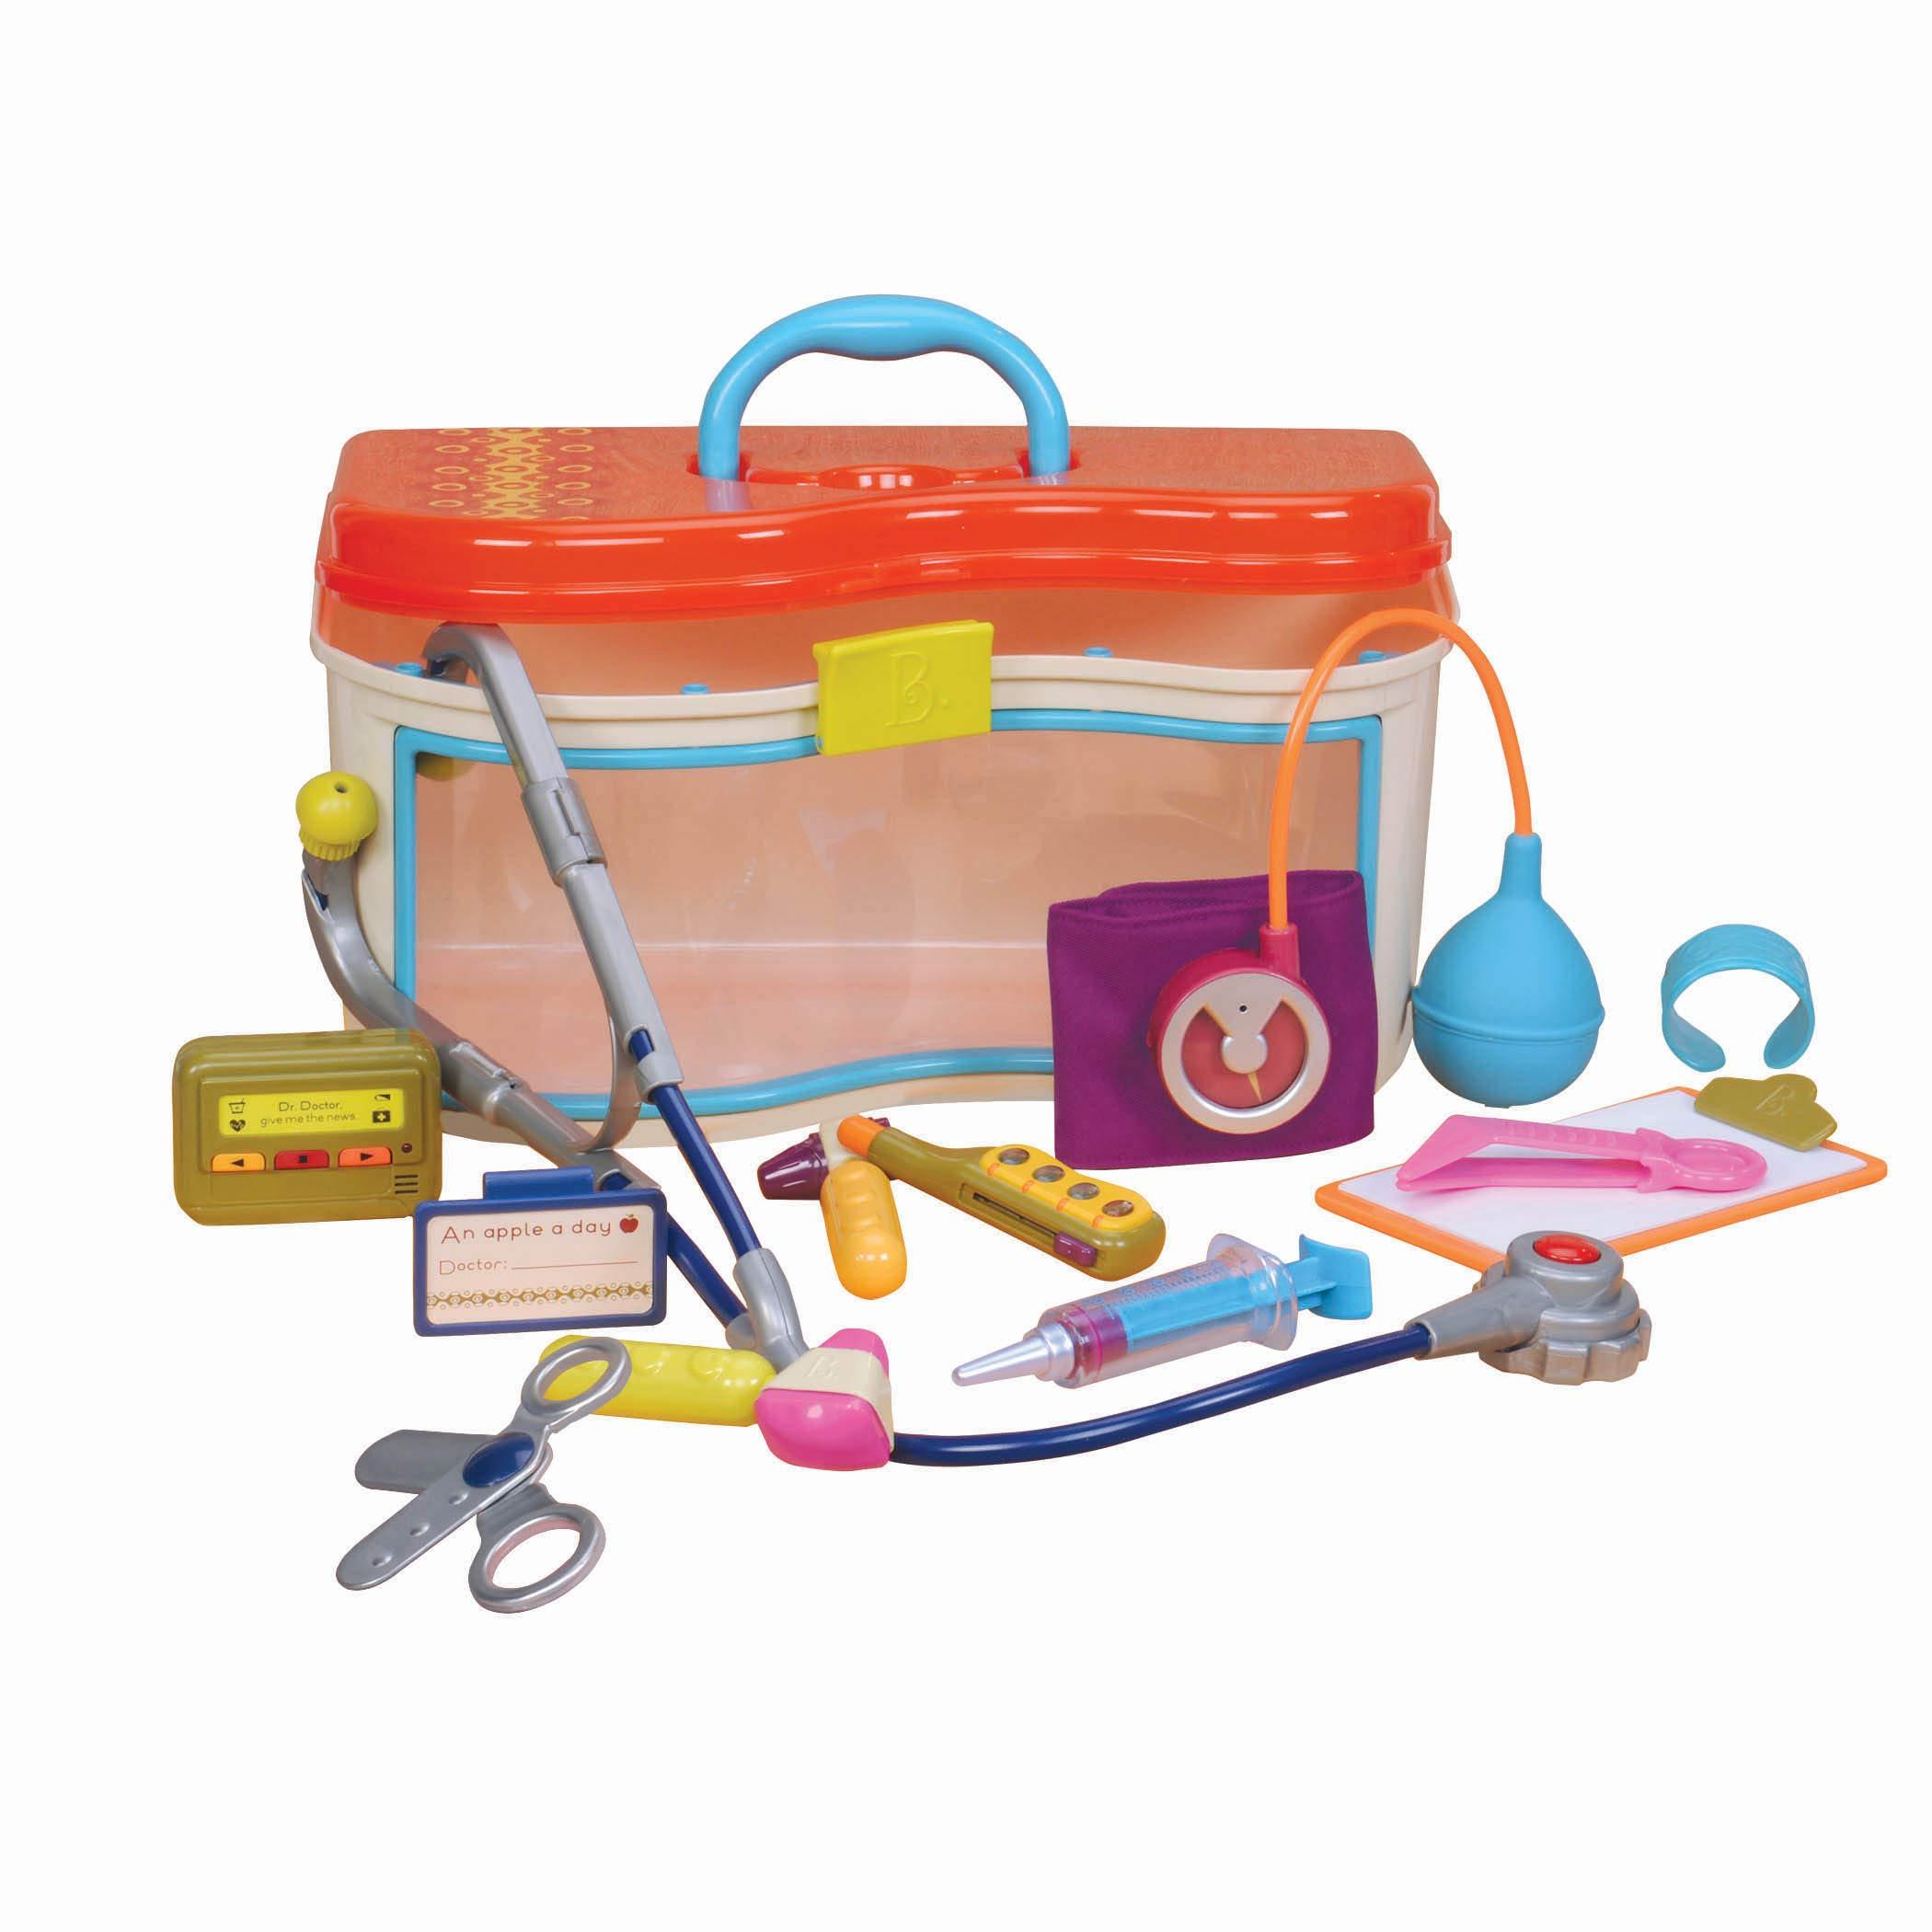 Battat B. Wee MD Doctor Kit by Battat